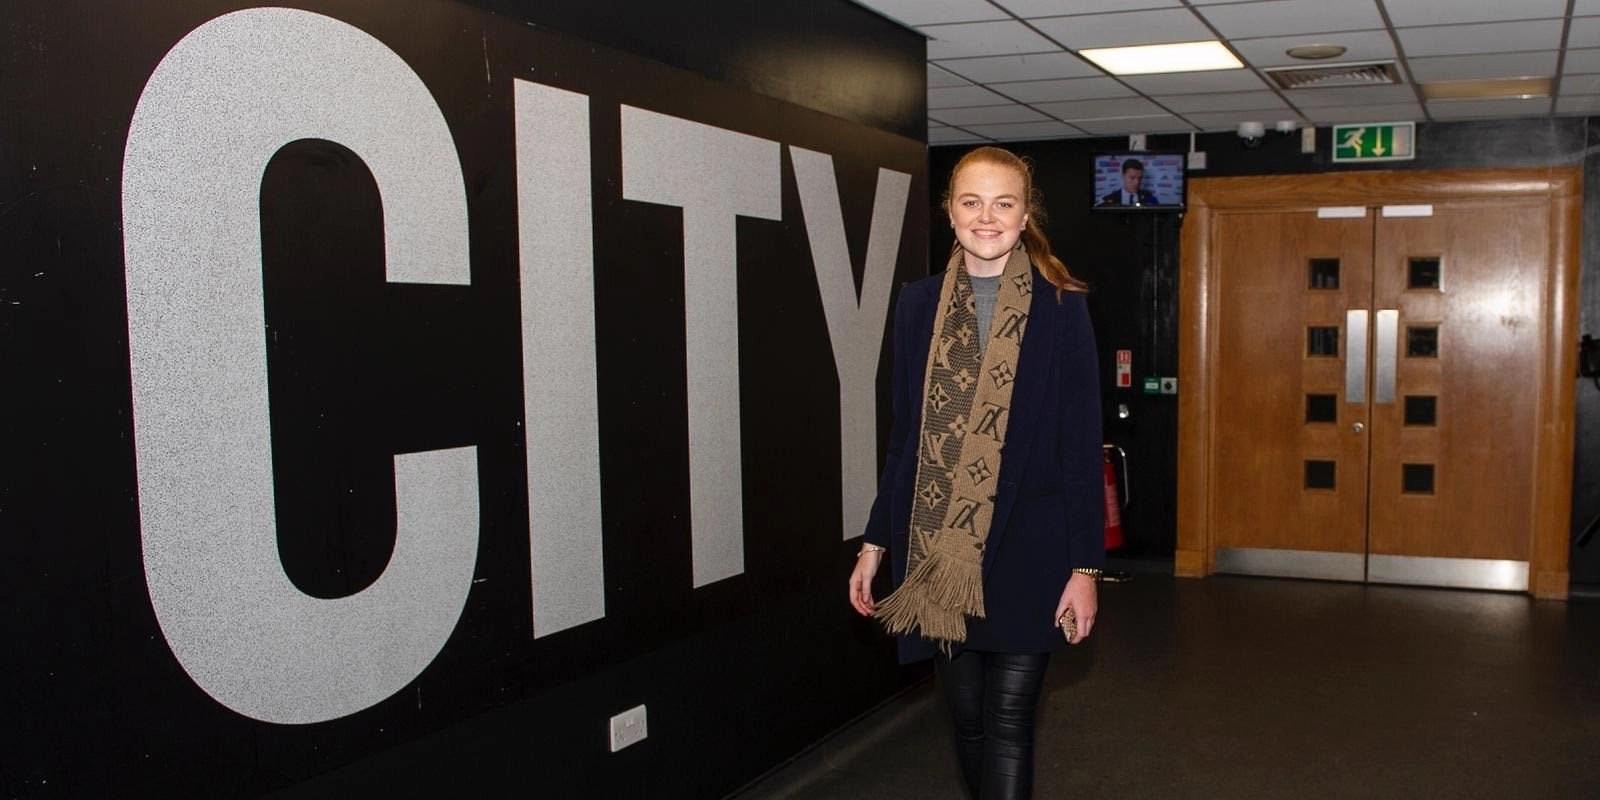 Sophie Davis | Swansea City's PR & Marketing Coordinator